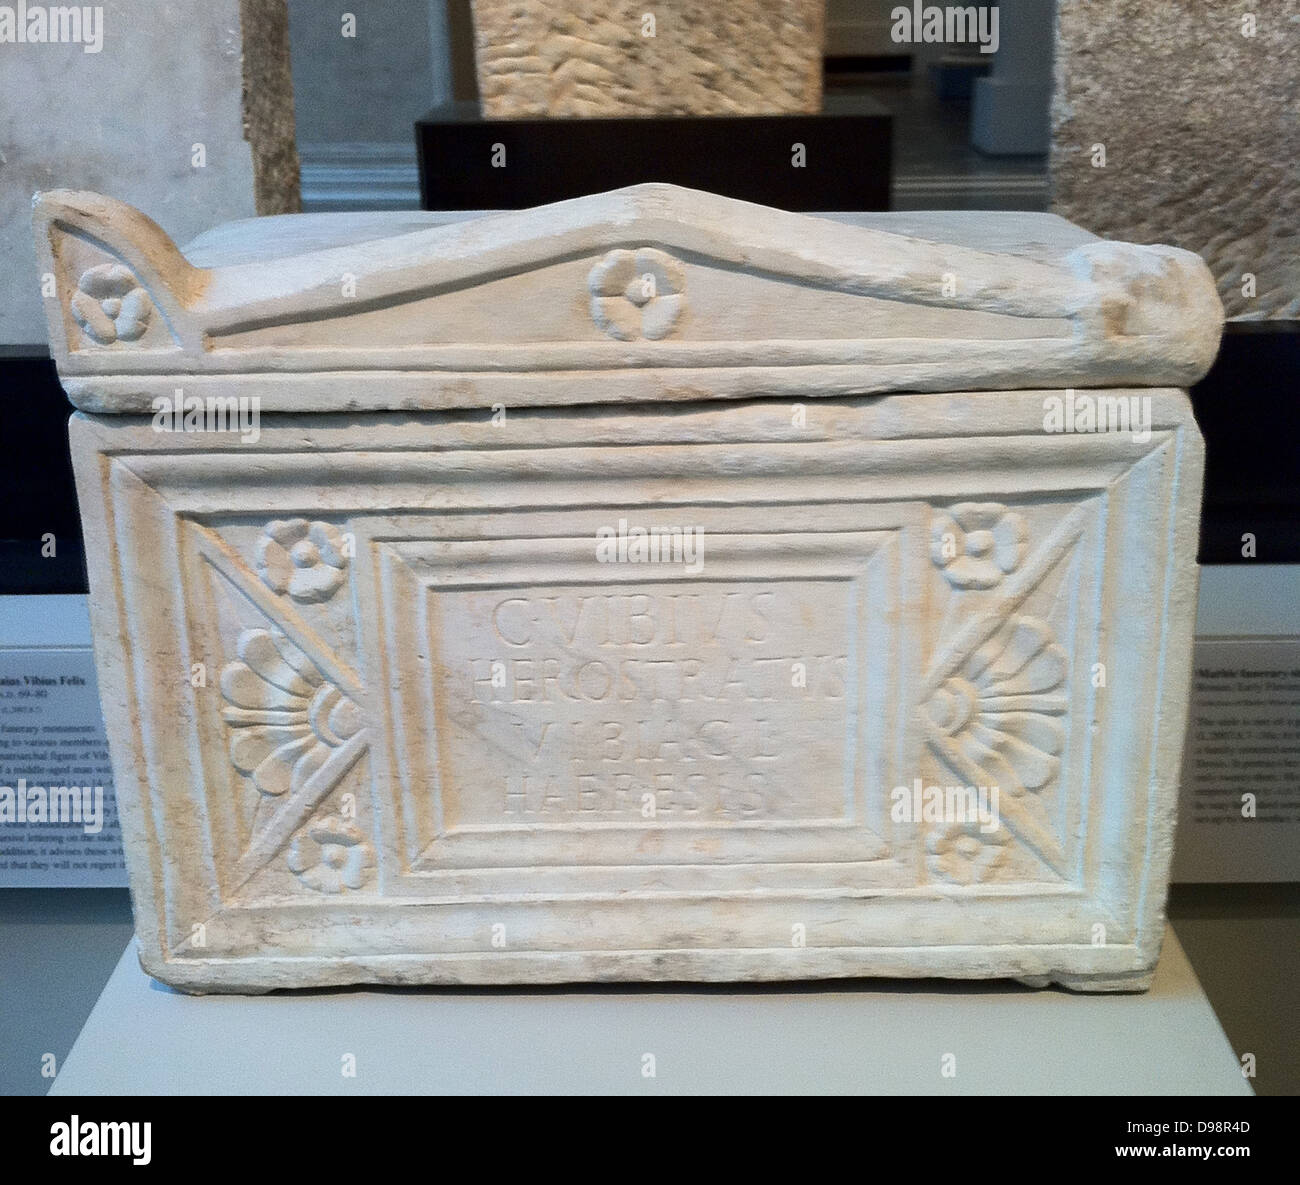 Marble Roman cinerary chest. Roman AD 69-80 AD - Stock Image